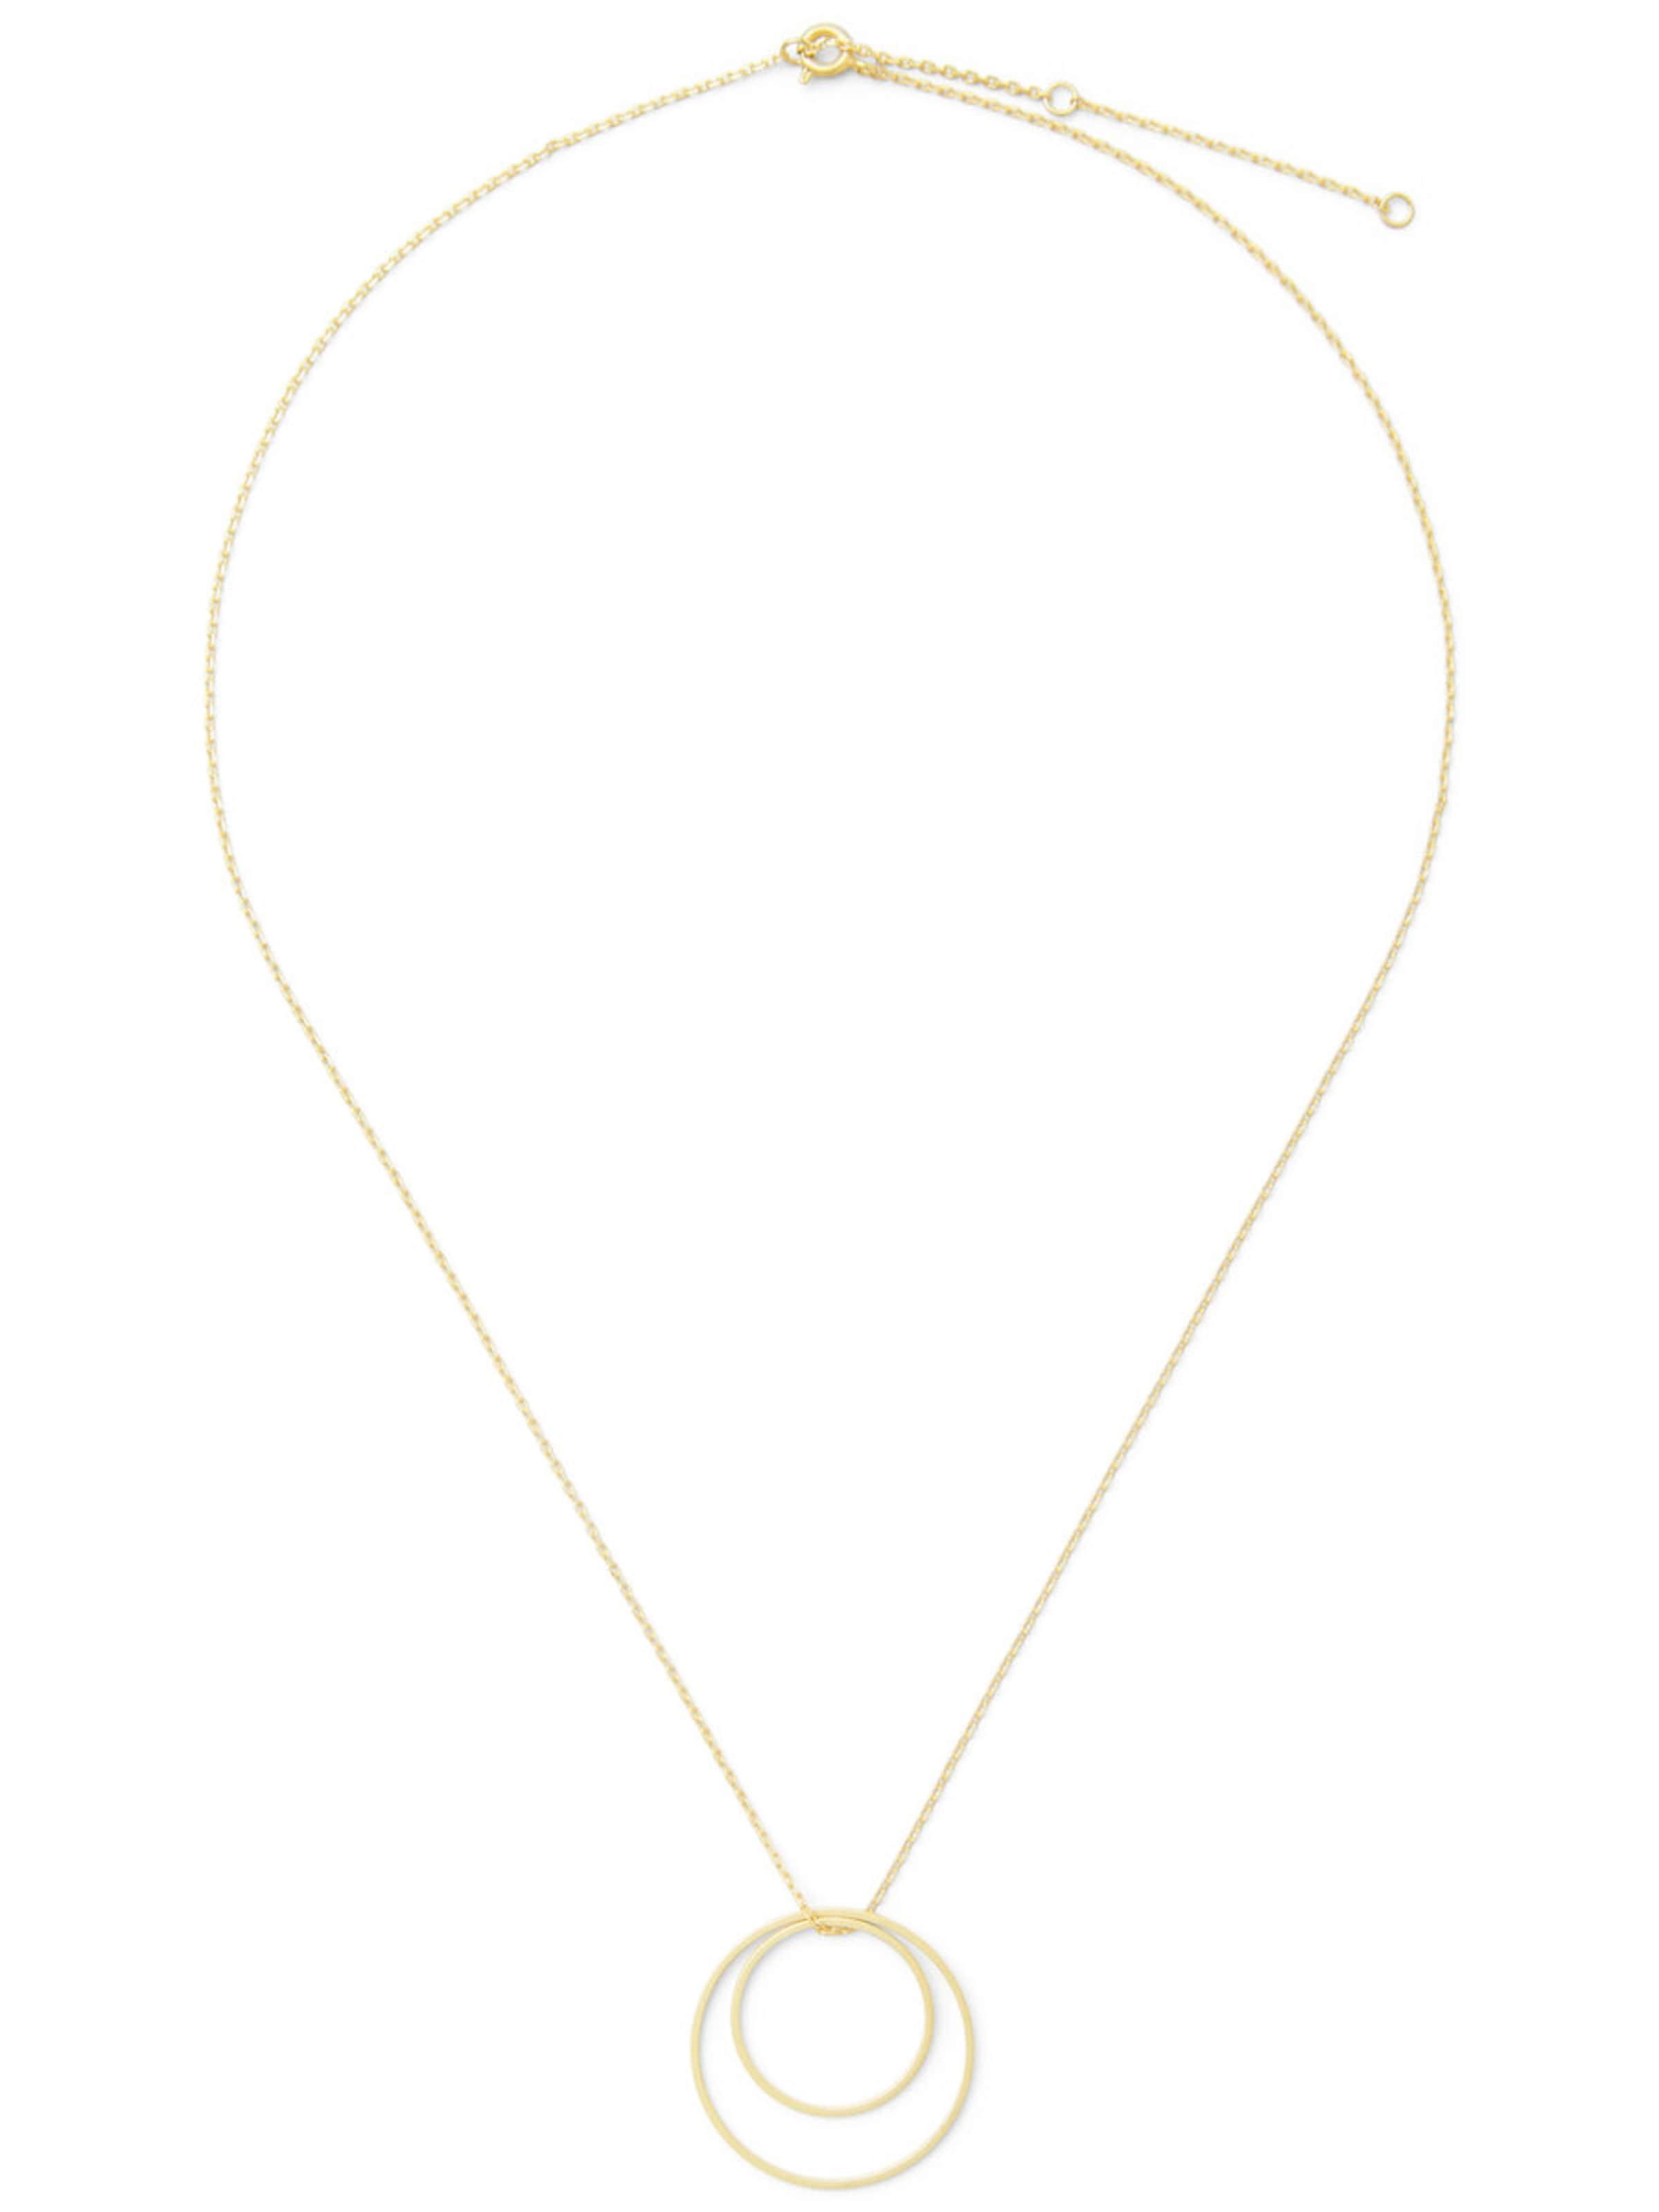 VILA Halskette Simply Verkauf In Mode Auslass Offiziellen Auslassstellen Verkauf Online Verkauf Online-Shop cAic7q